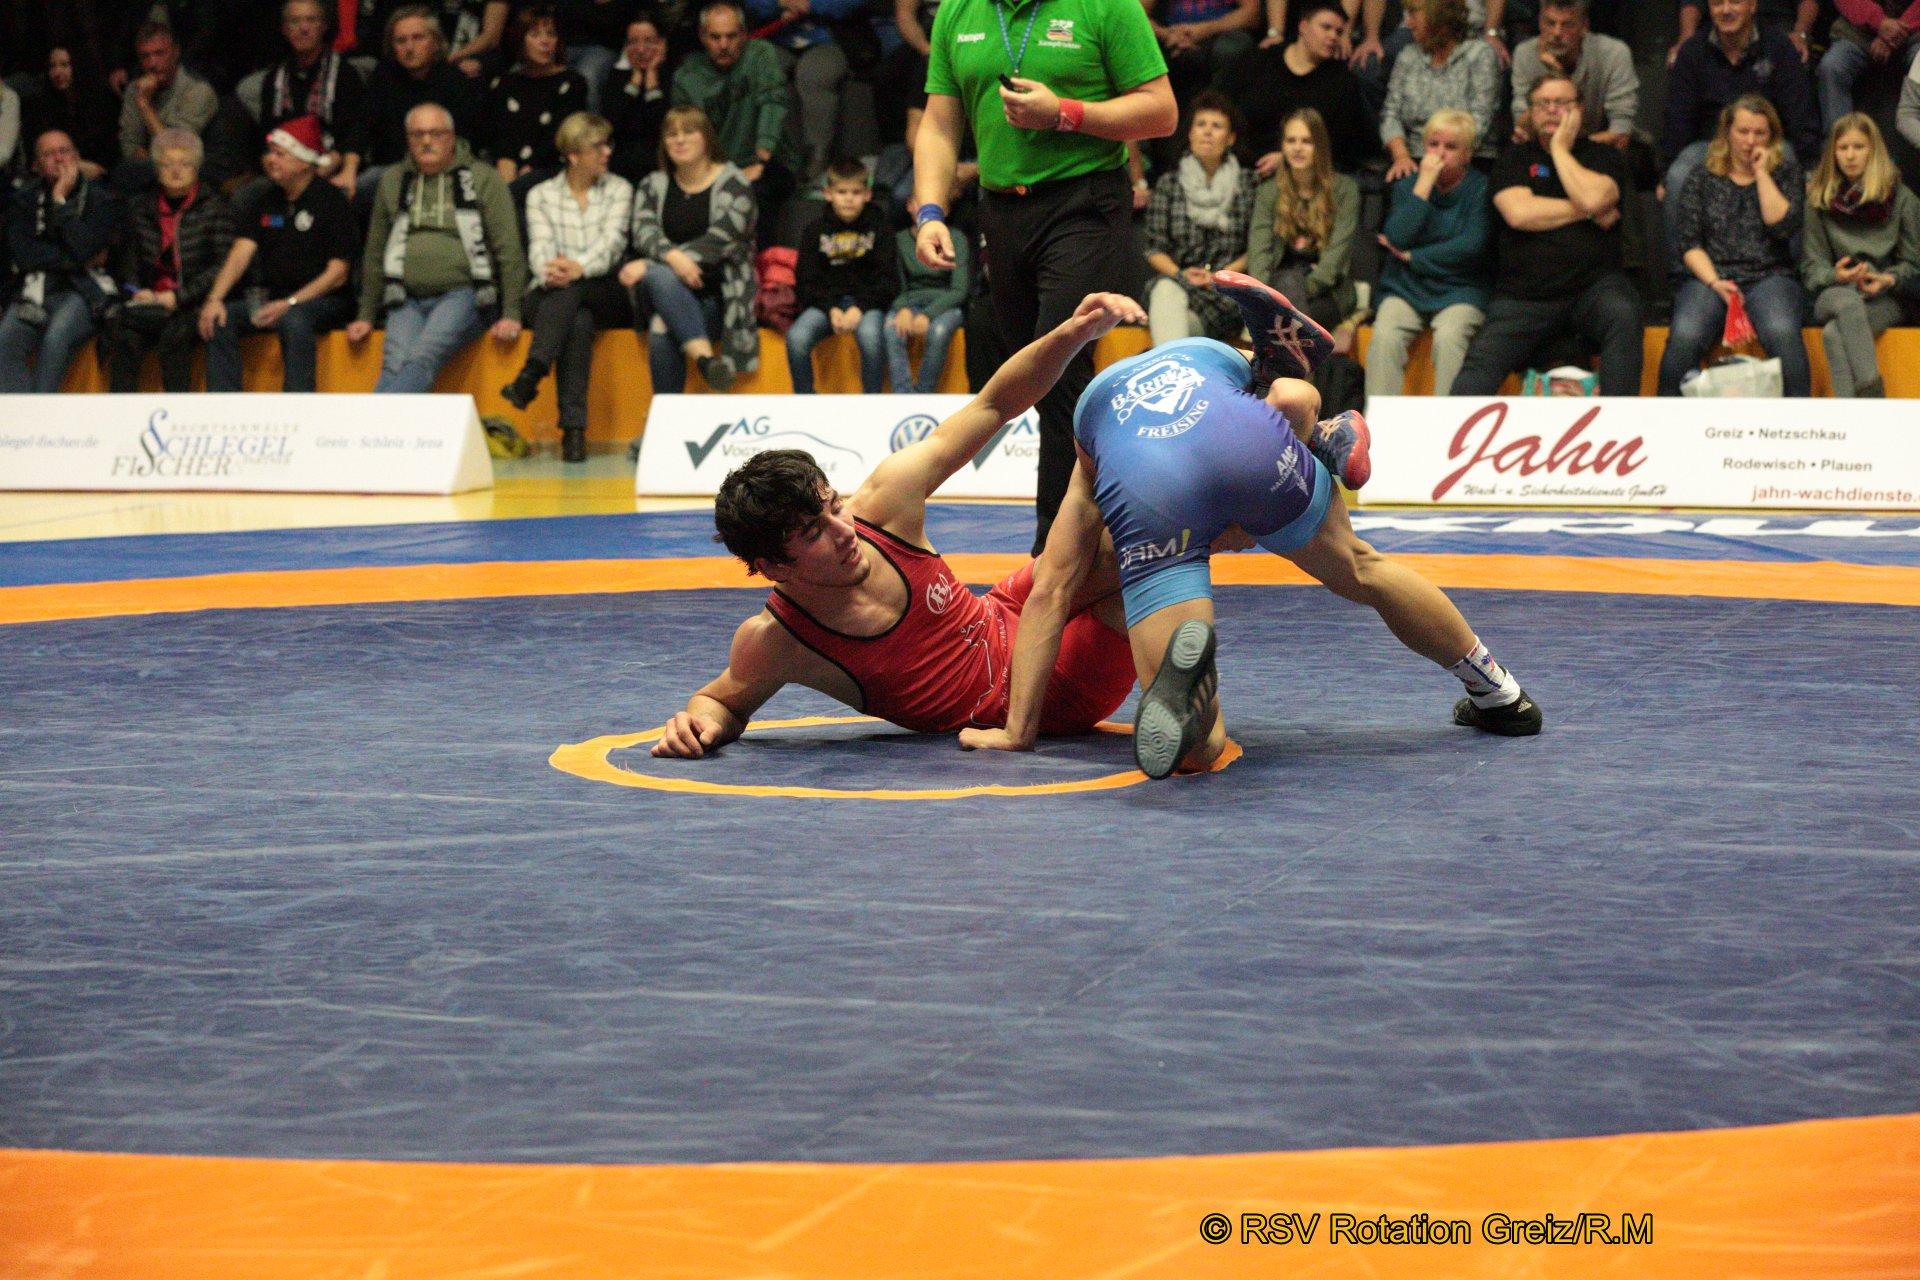 61kg Freistil: Rasul Galamatov JN4 (-2) (rotes Trikot), RSV Rotation Greiz gegen Thomas Kopp (-2), SV Hallbergmoos 0:4/TÜ/3:18/05:22